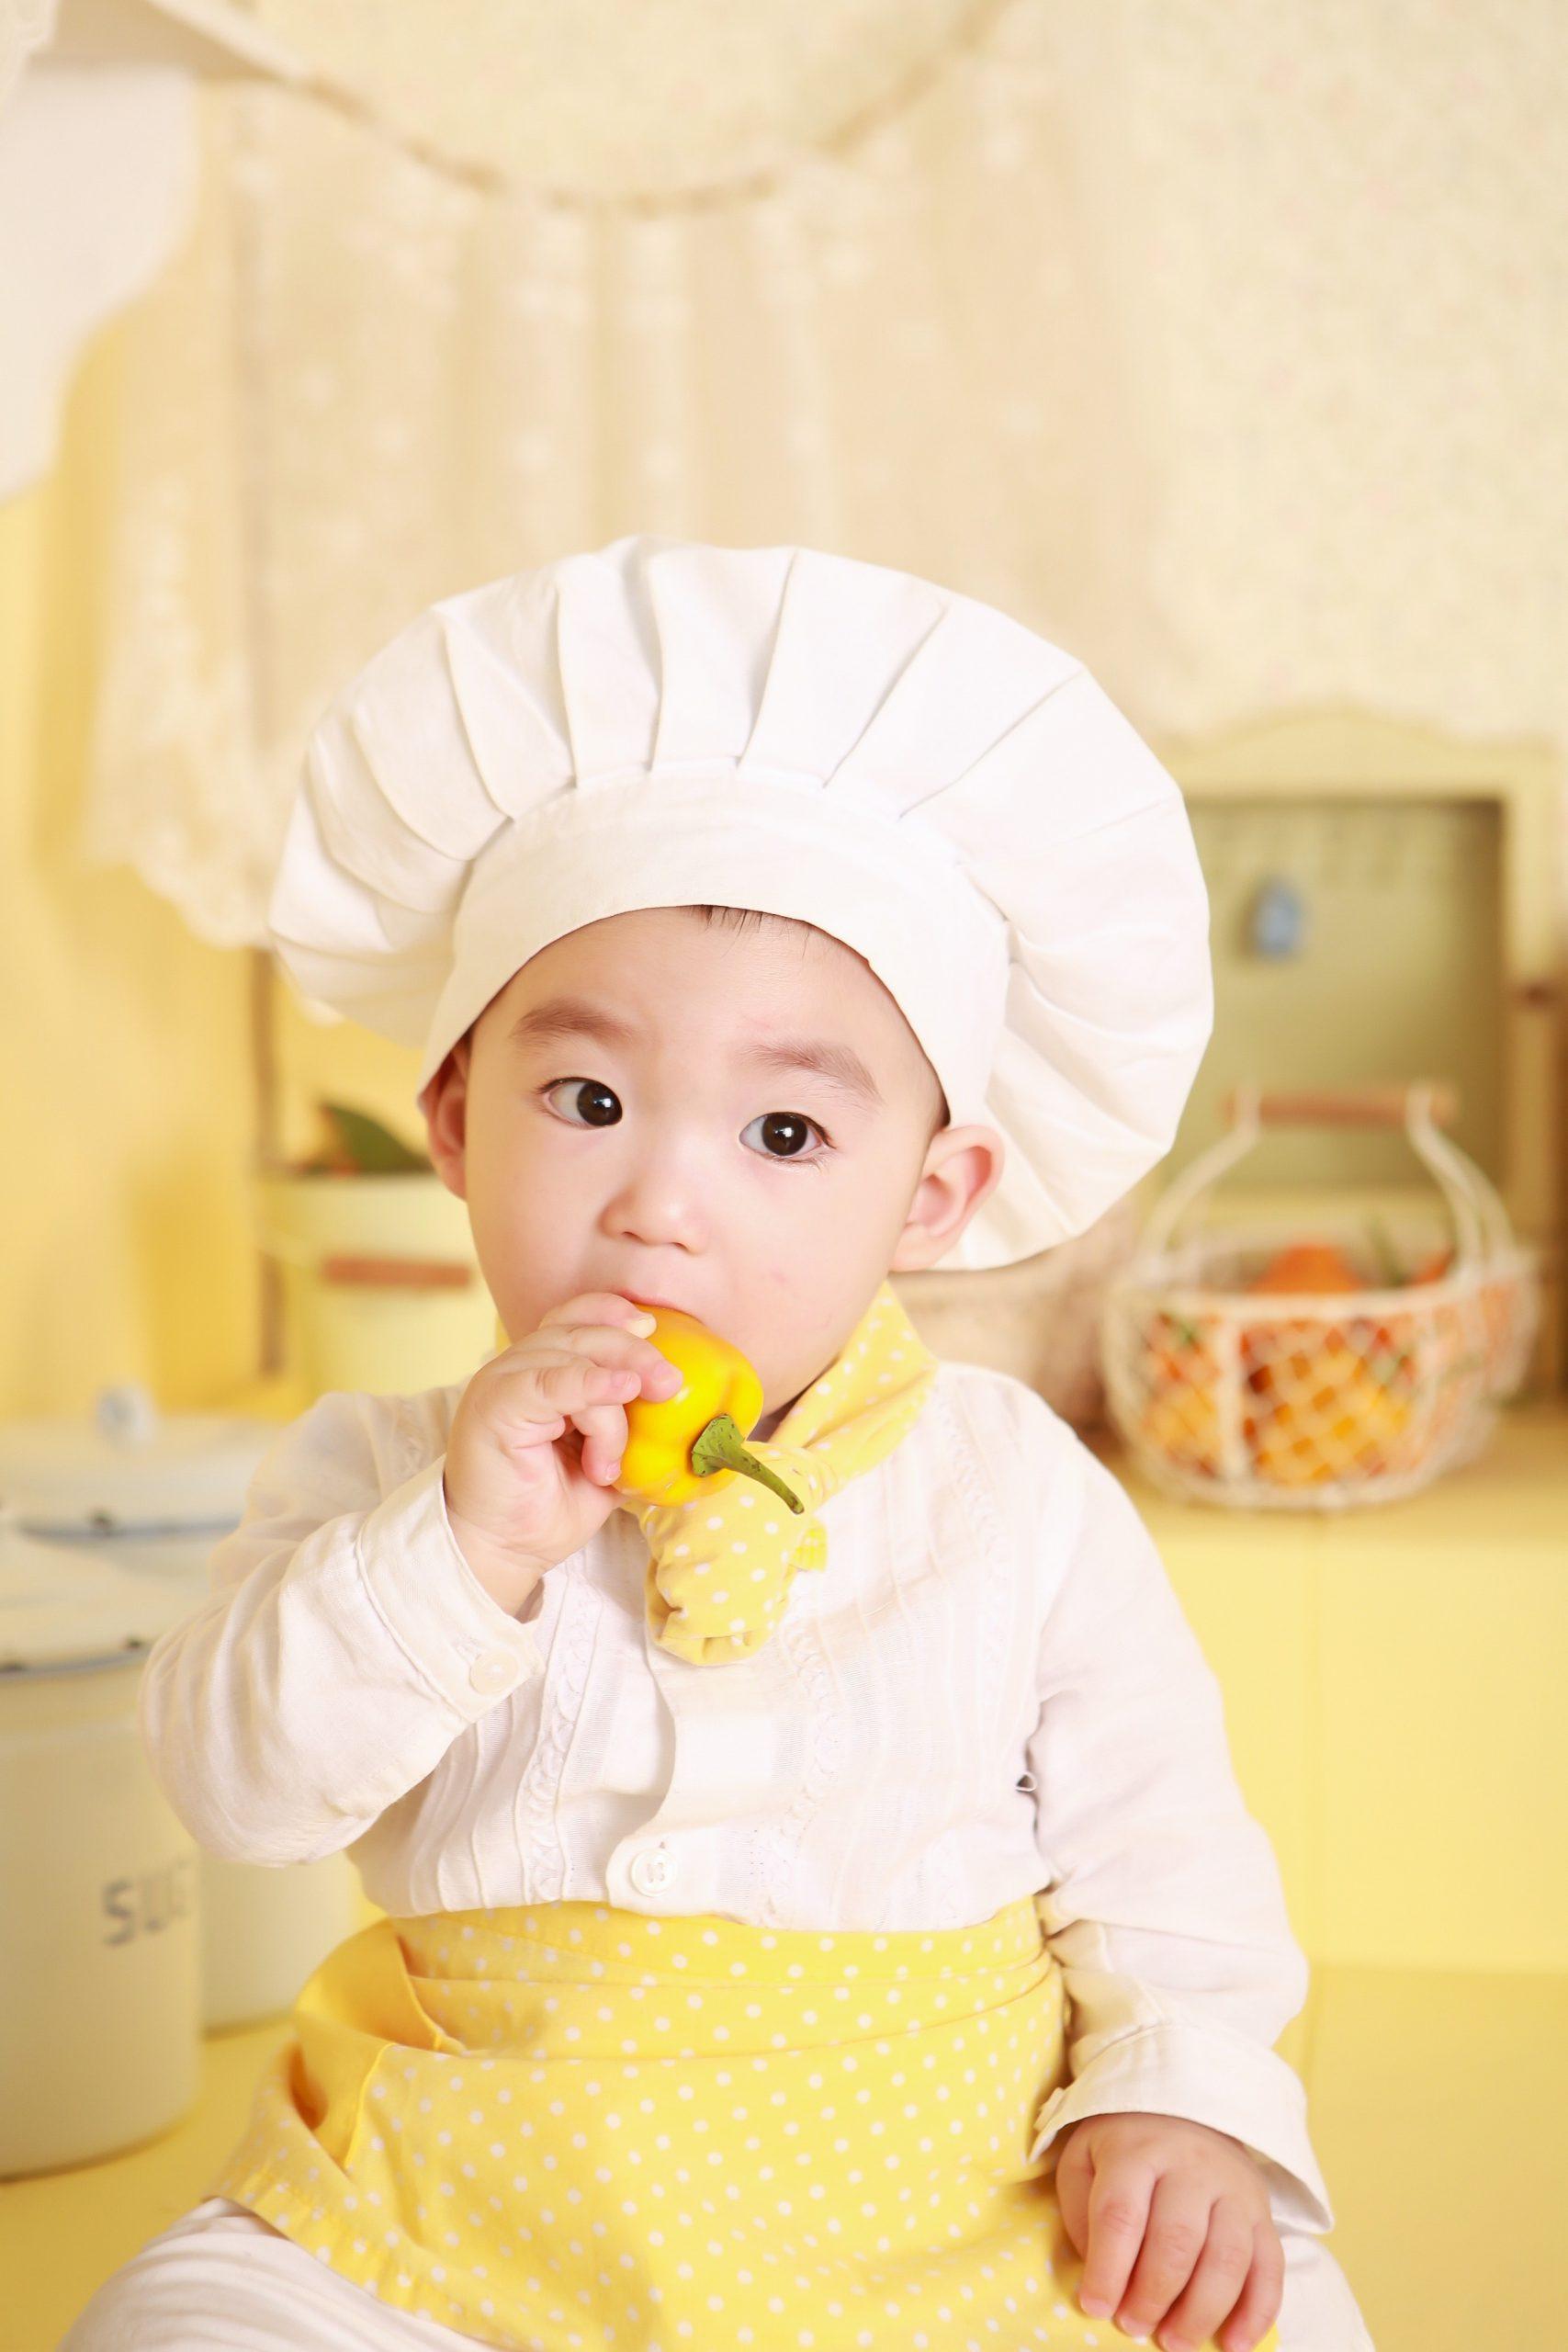 alimentacion complementaria en bebes